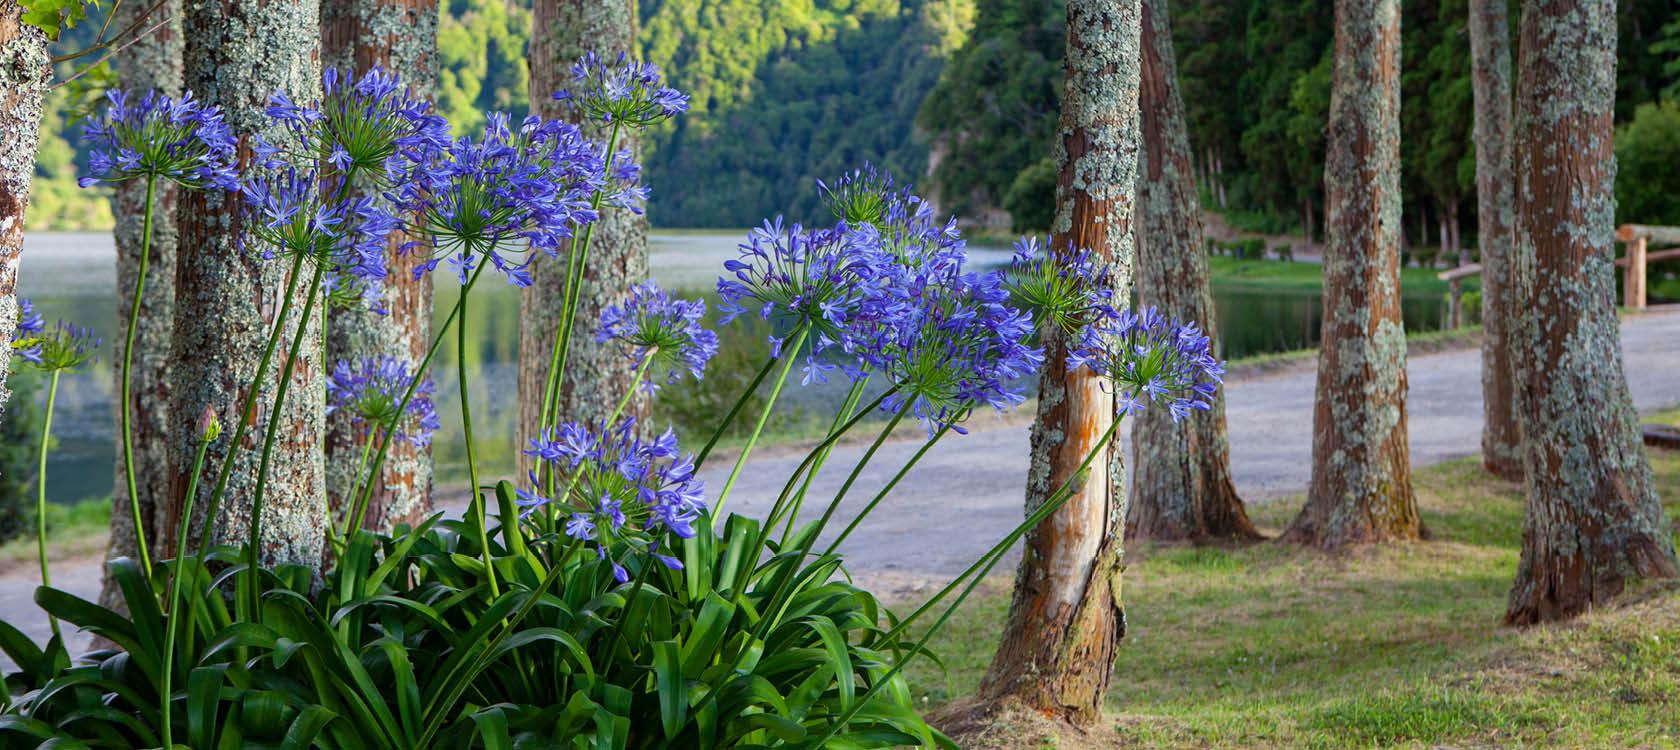 Blommor på Azorerna, Portugal.